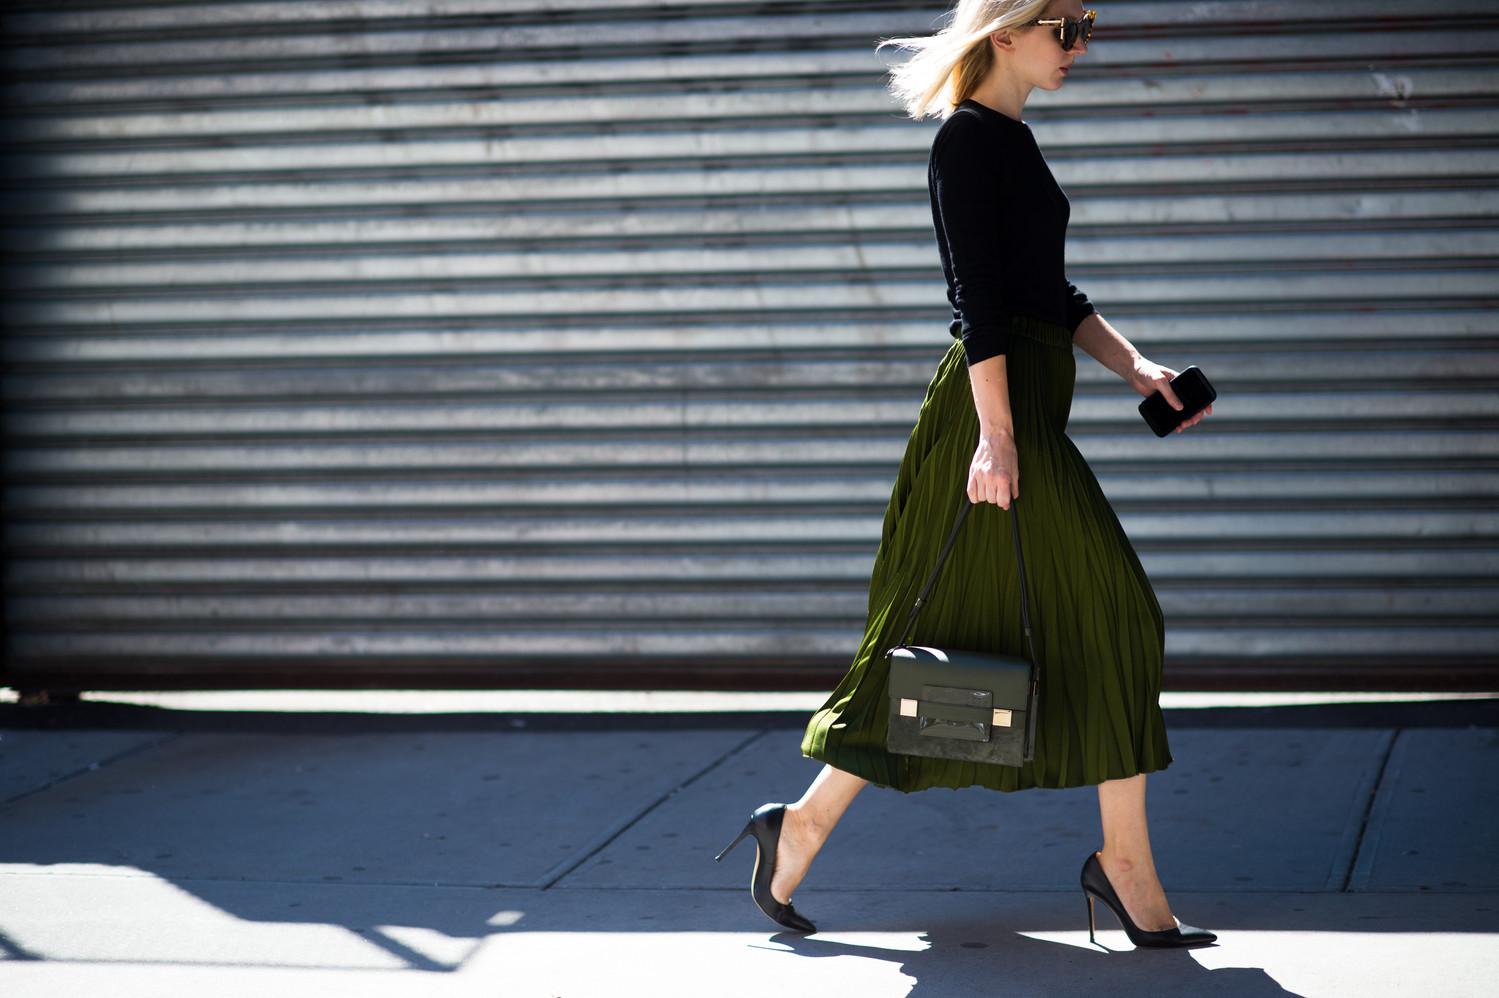 Fashion stylist internship london